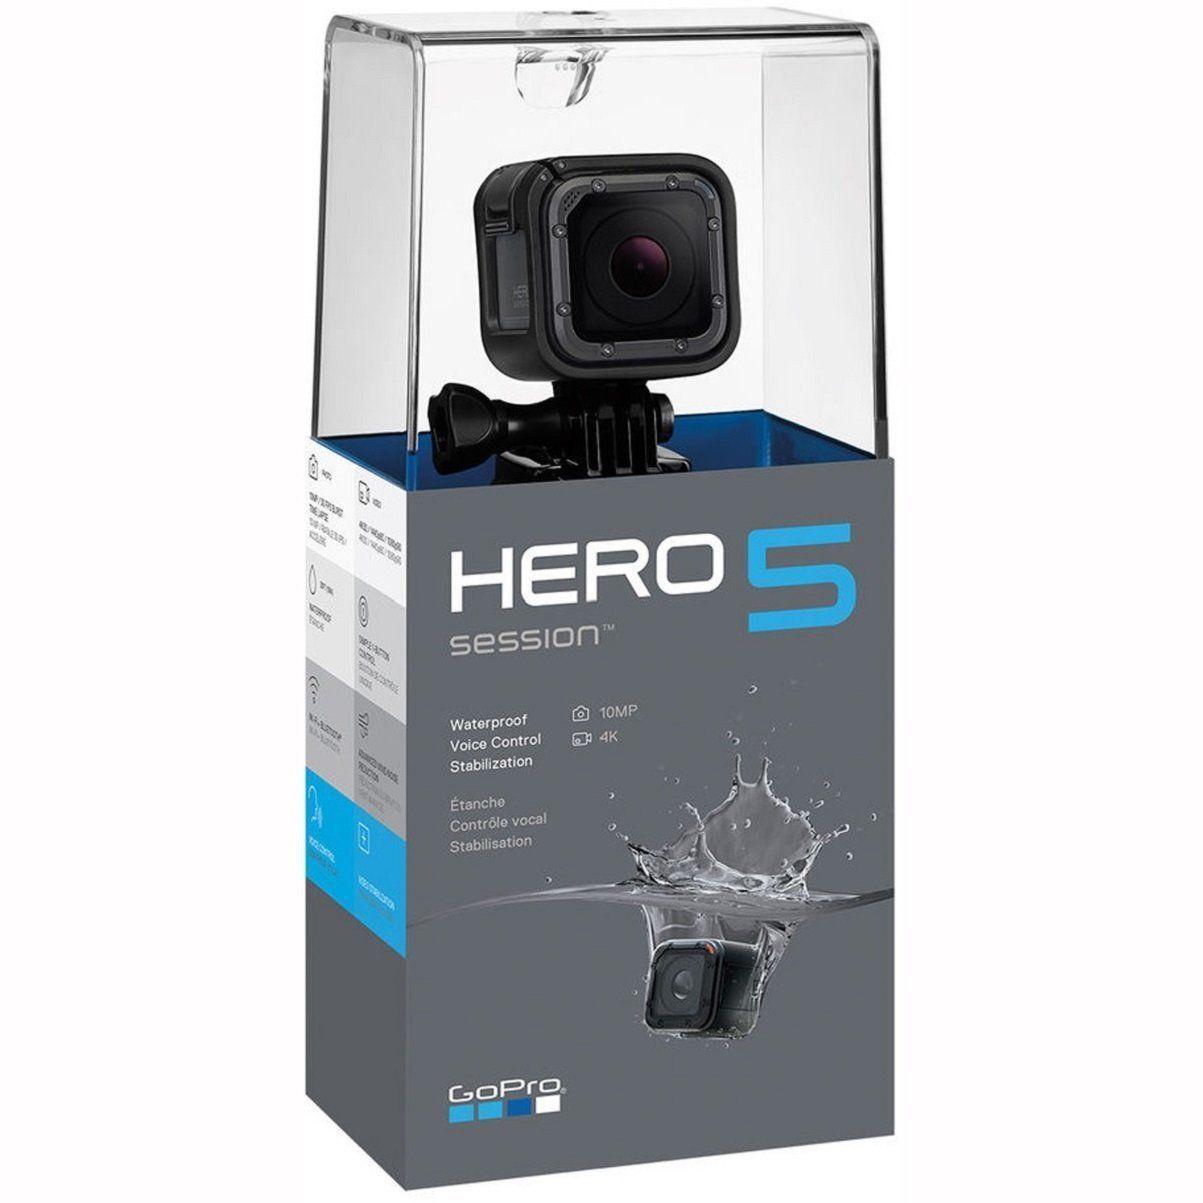 GoPro Hero5 Session Model 4K Extraordinarily HD, Wi-Fi Waterproof Movement Digicam -**NEW**